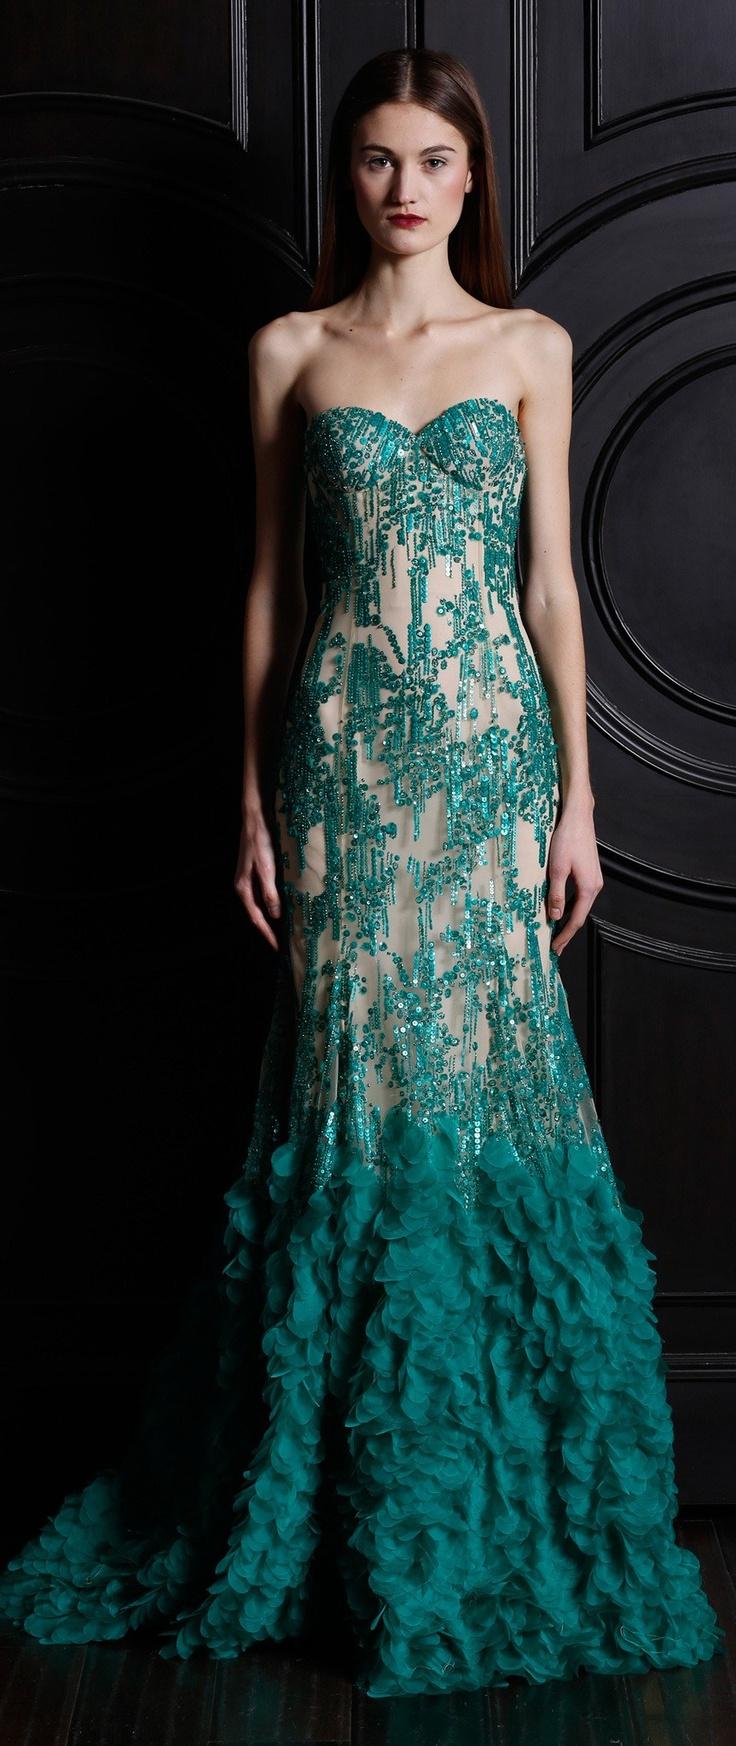 286 best Wedding Dresses images on Pinterest | Homecoming dresses ...